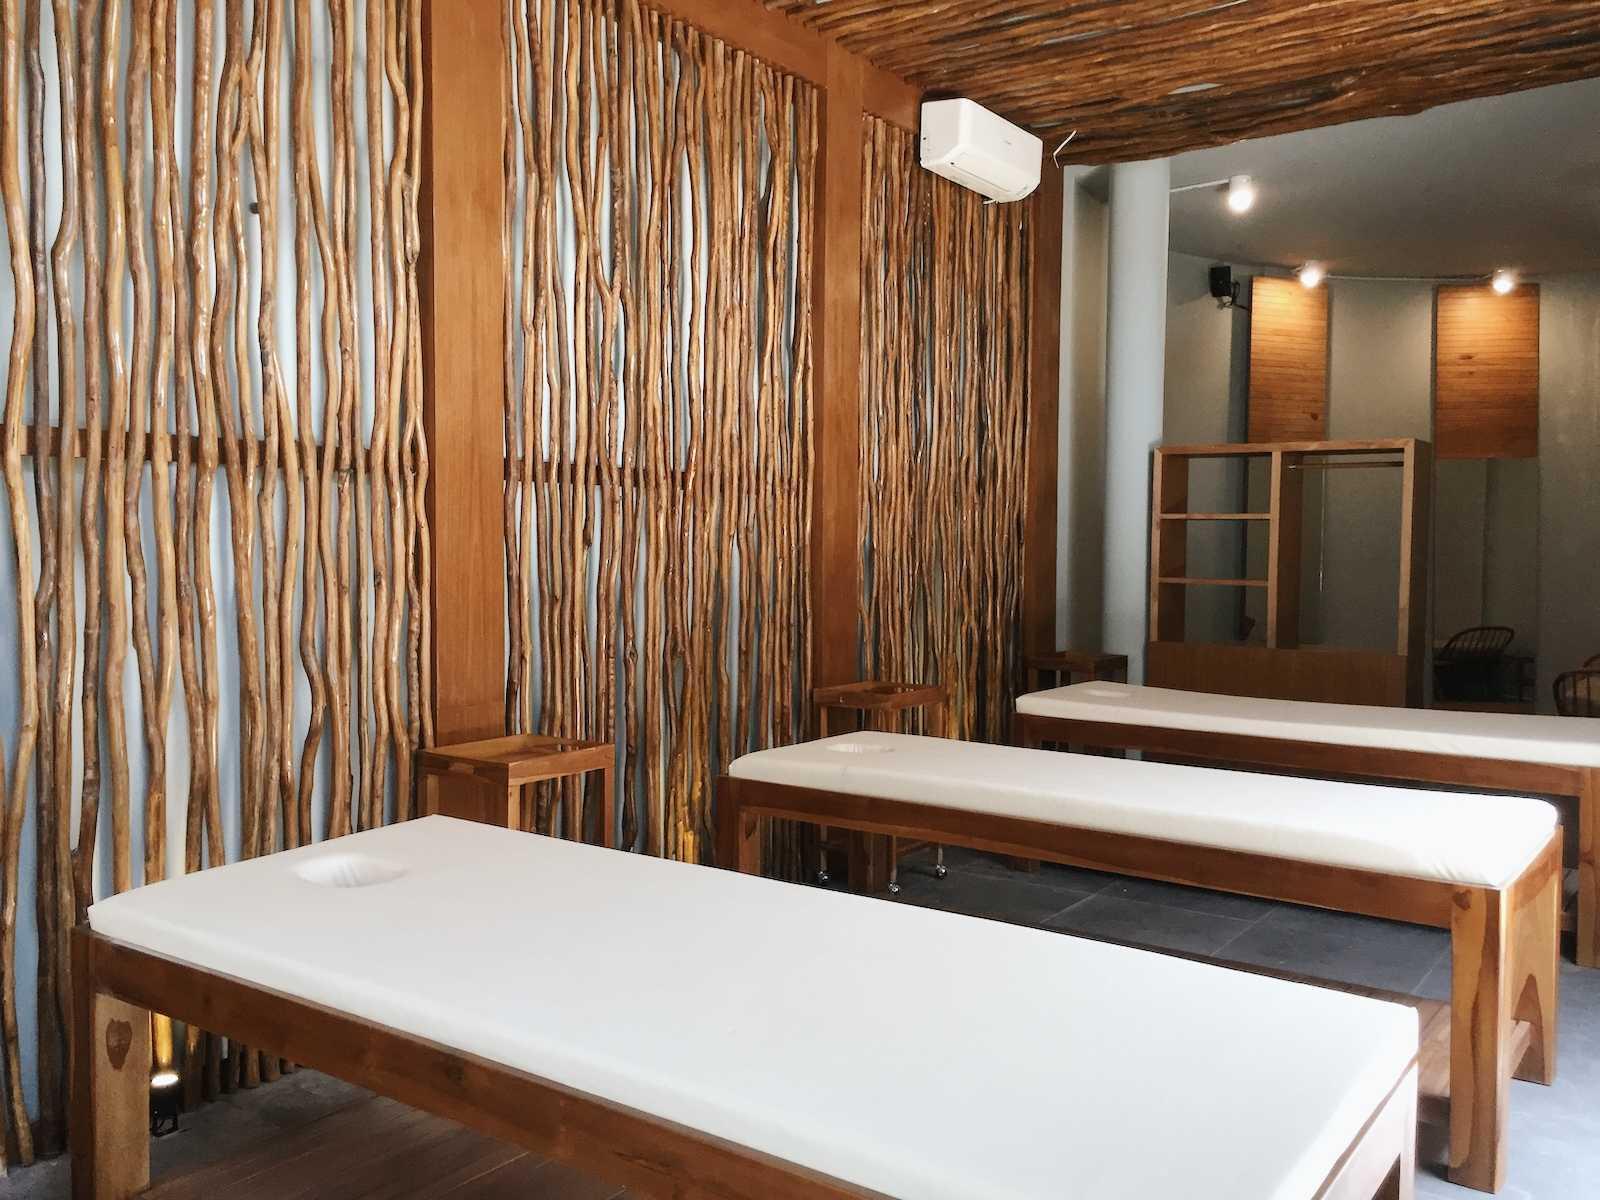 Sume Interior Taman Air Spa Jl. Sunset Road No.88, Kuta, Kabupaten Badung, Bali 80361, Indonesia Jl. Sunset Road No.88, Kuta, Kabupaten Badung, Bali 80361, Indonesia Sume-Interior-Taman-Air-Spa-Treatment-Room  101119